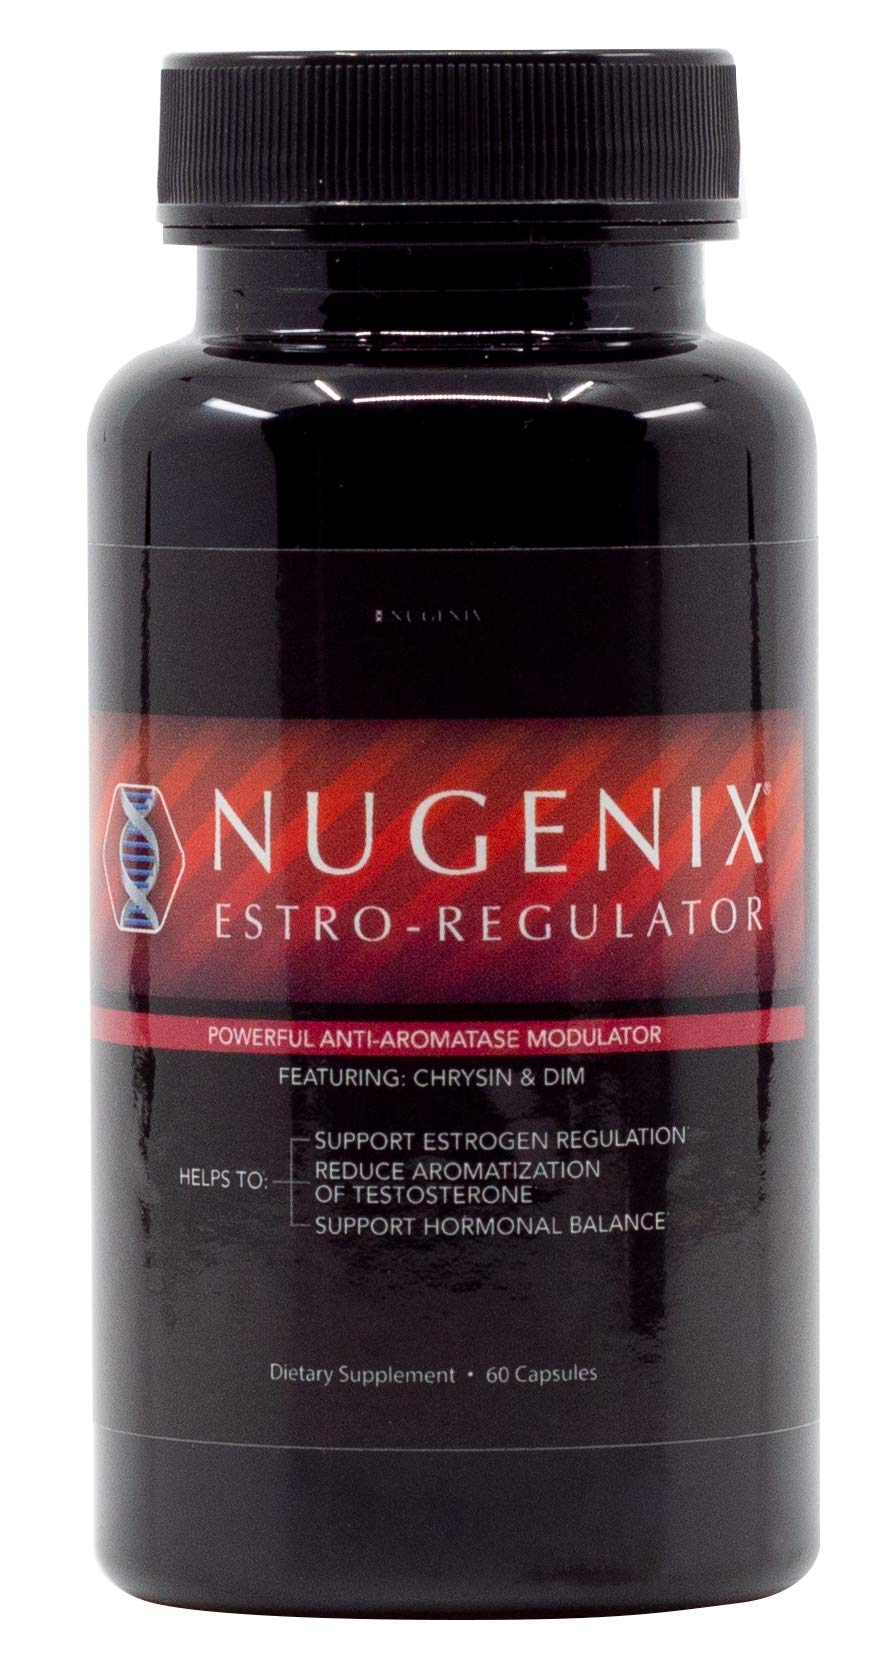 Nugenix Estro-Regulator - Power Estrogen Blocker, Boost Testosterone, Aromatase Inhibitor, DIM, Chrysin - 60 Capsules by Nugenix (Image #2)